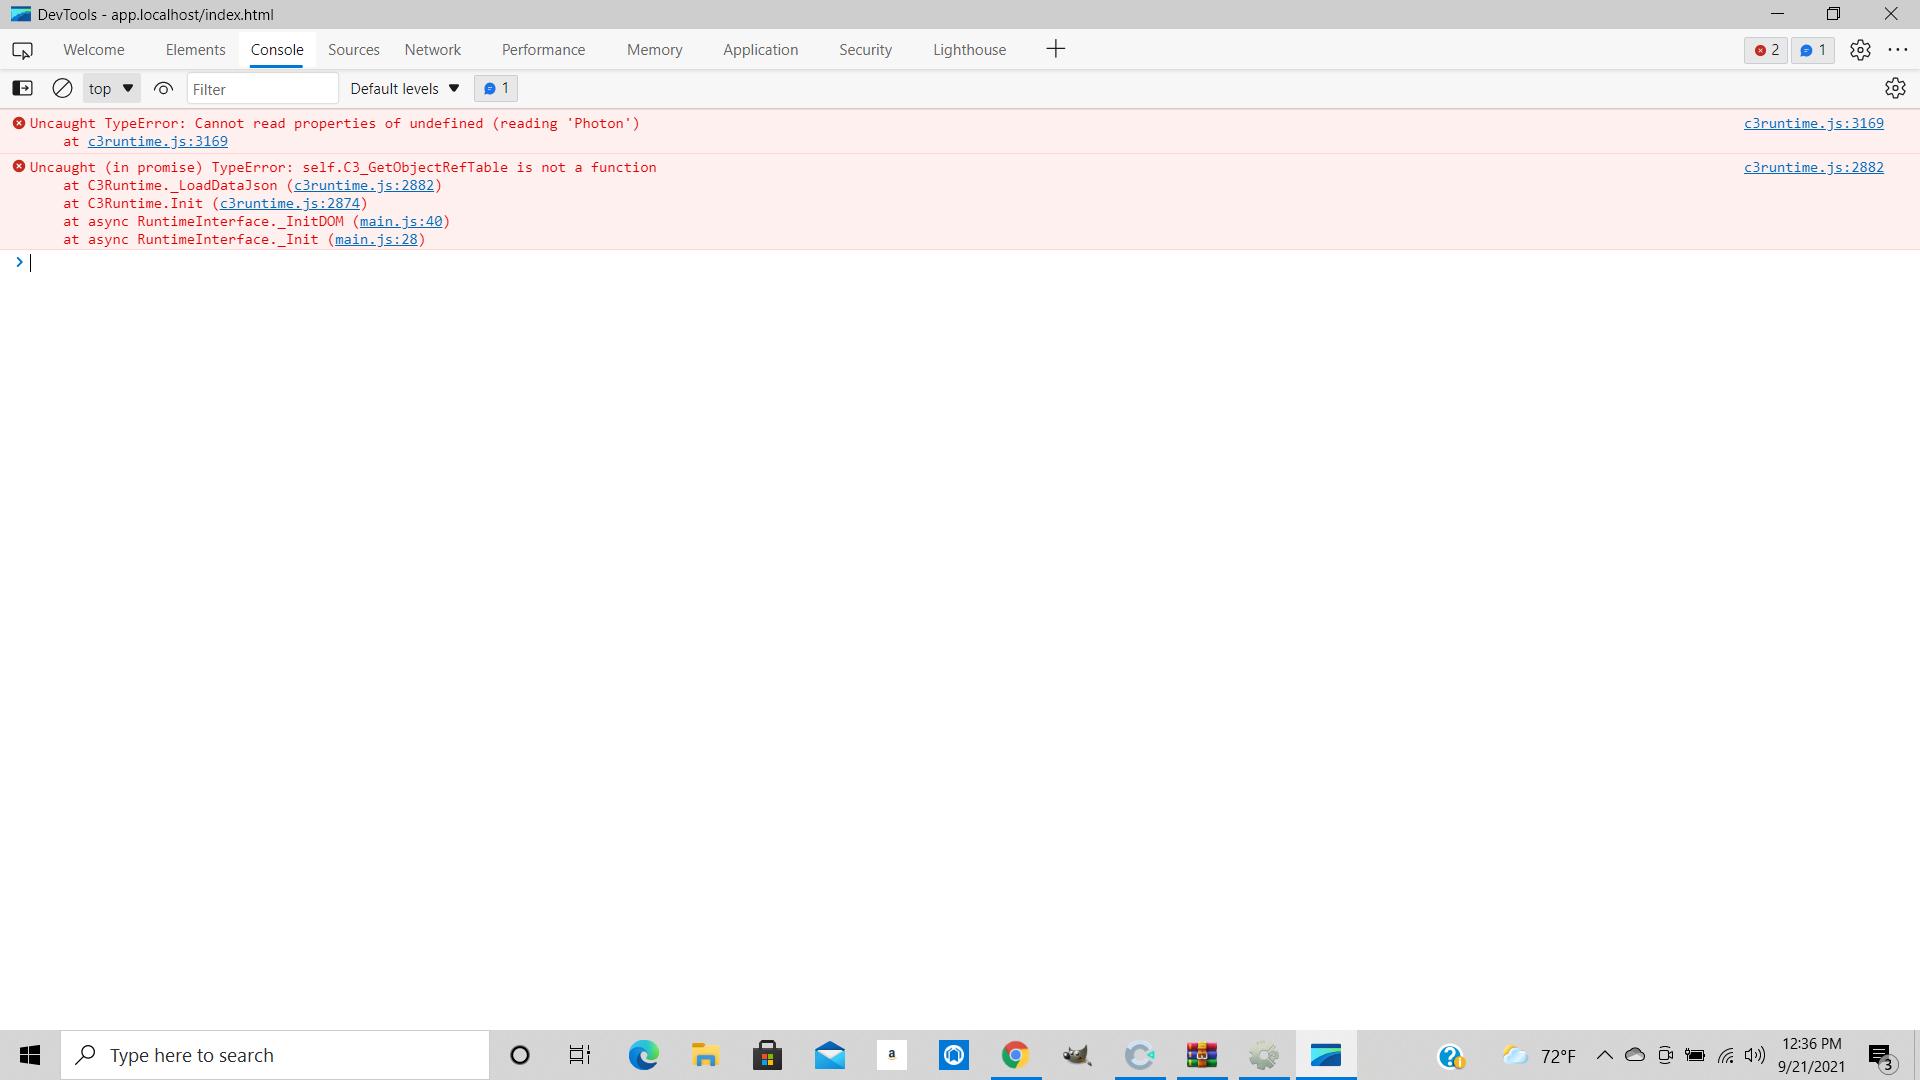 Screenshot 2021-09-21 12.36.52.png